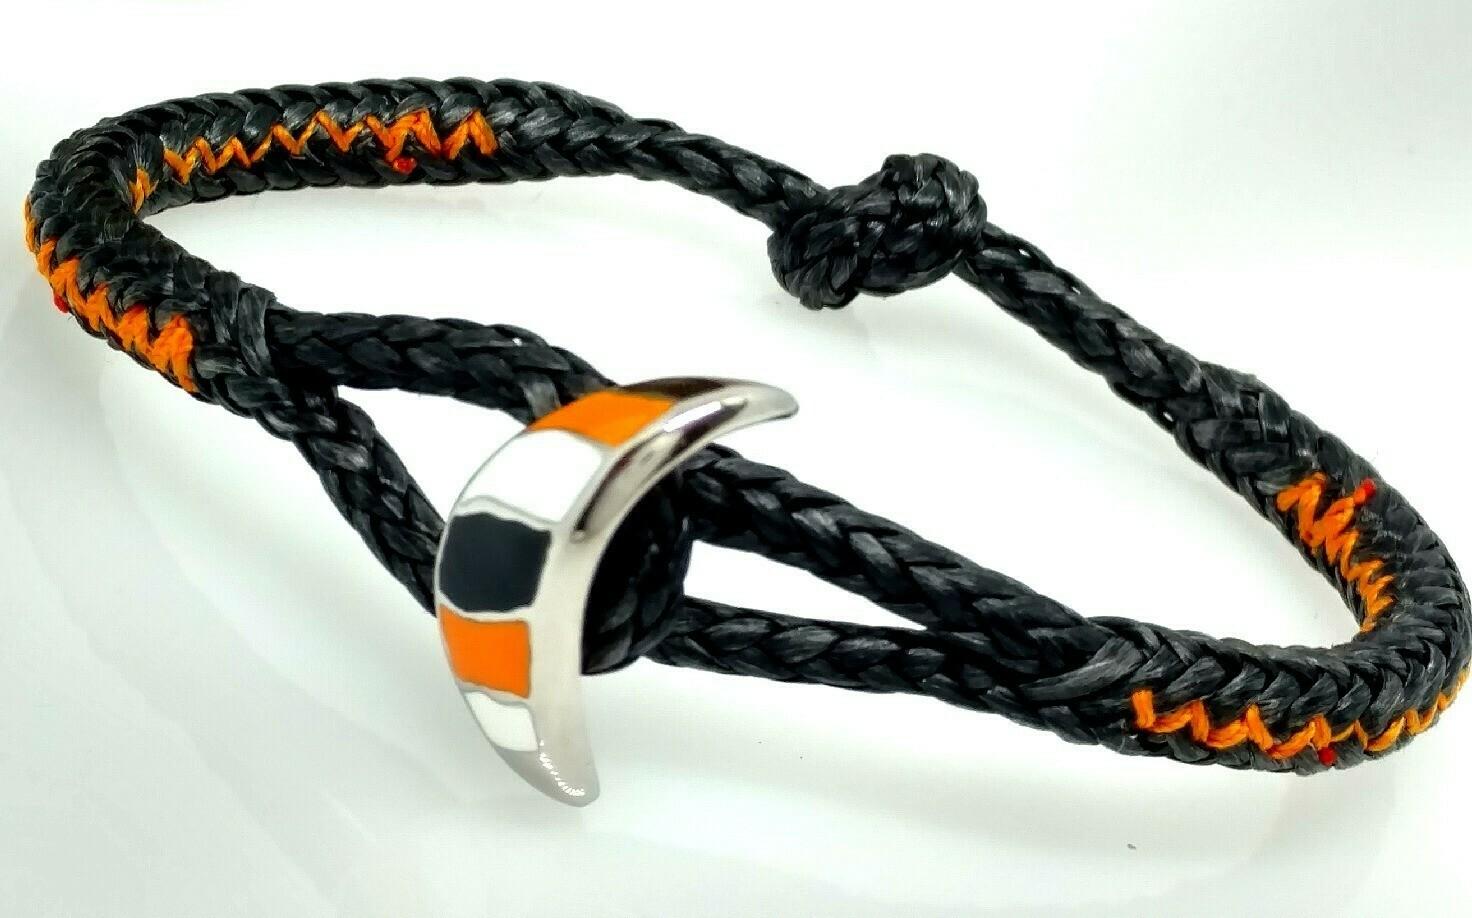 BKR - MISTRAL Black / White / Orange